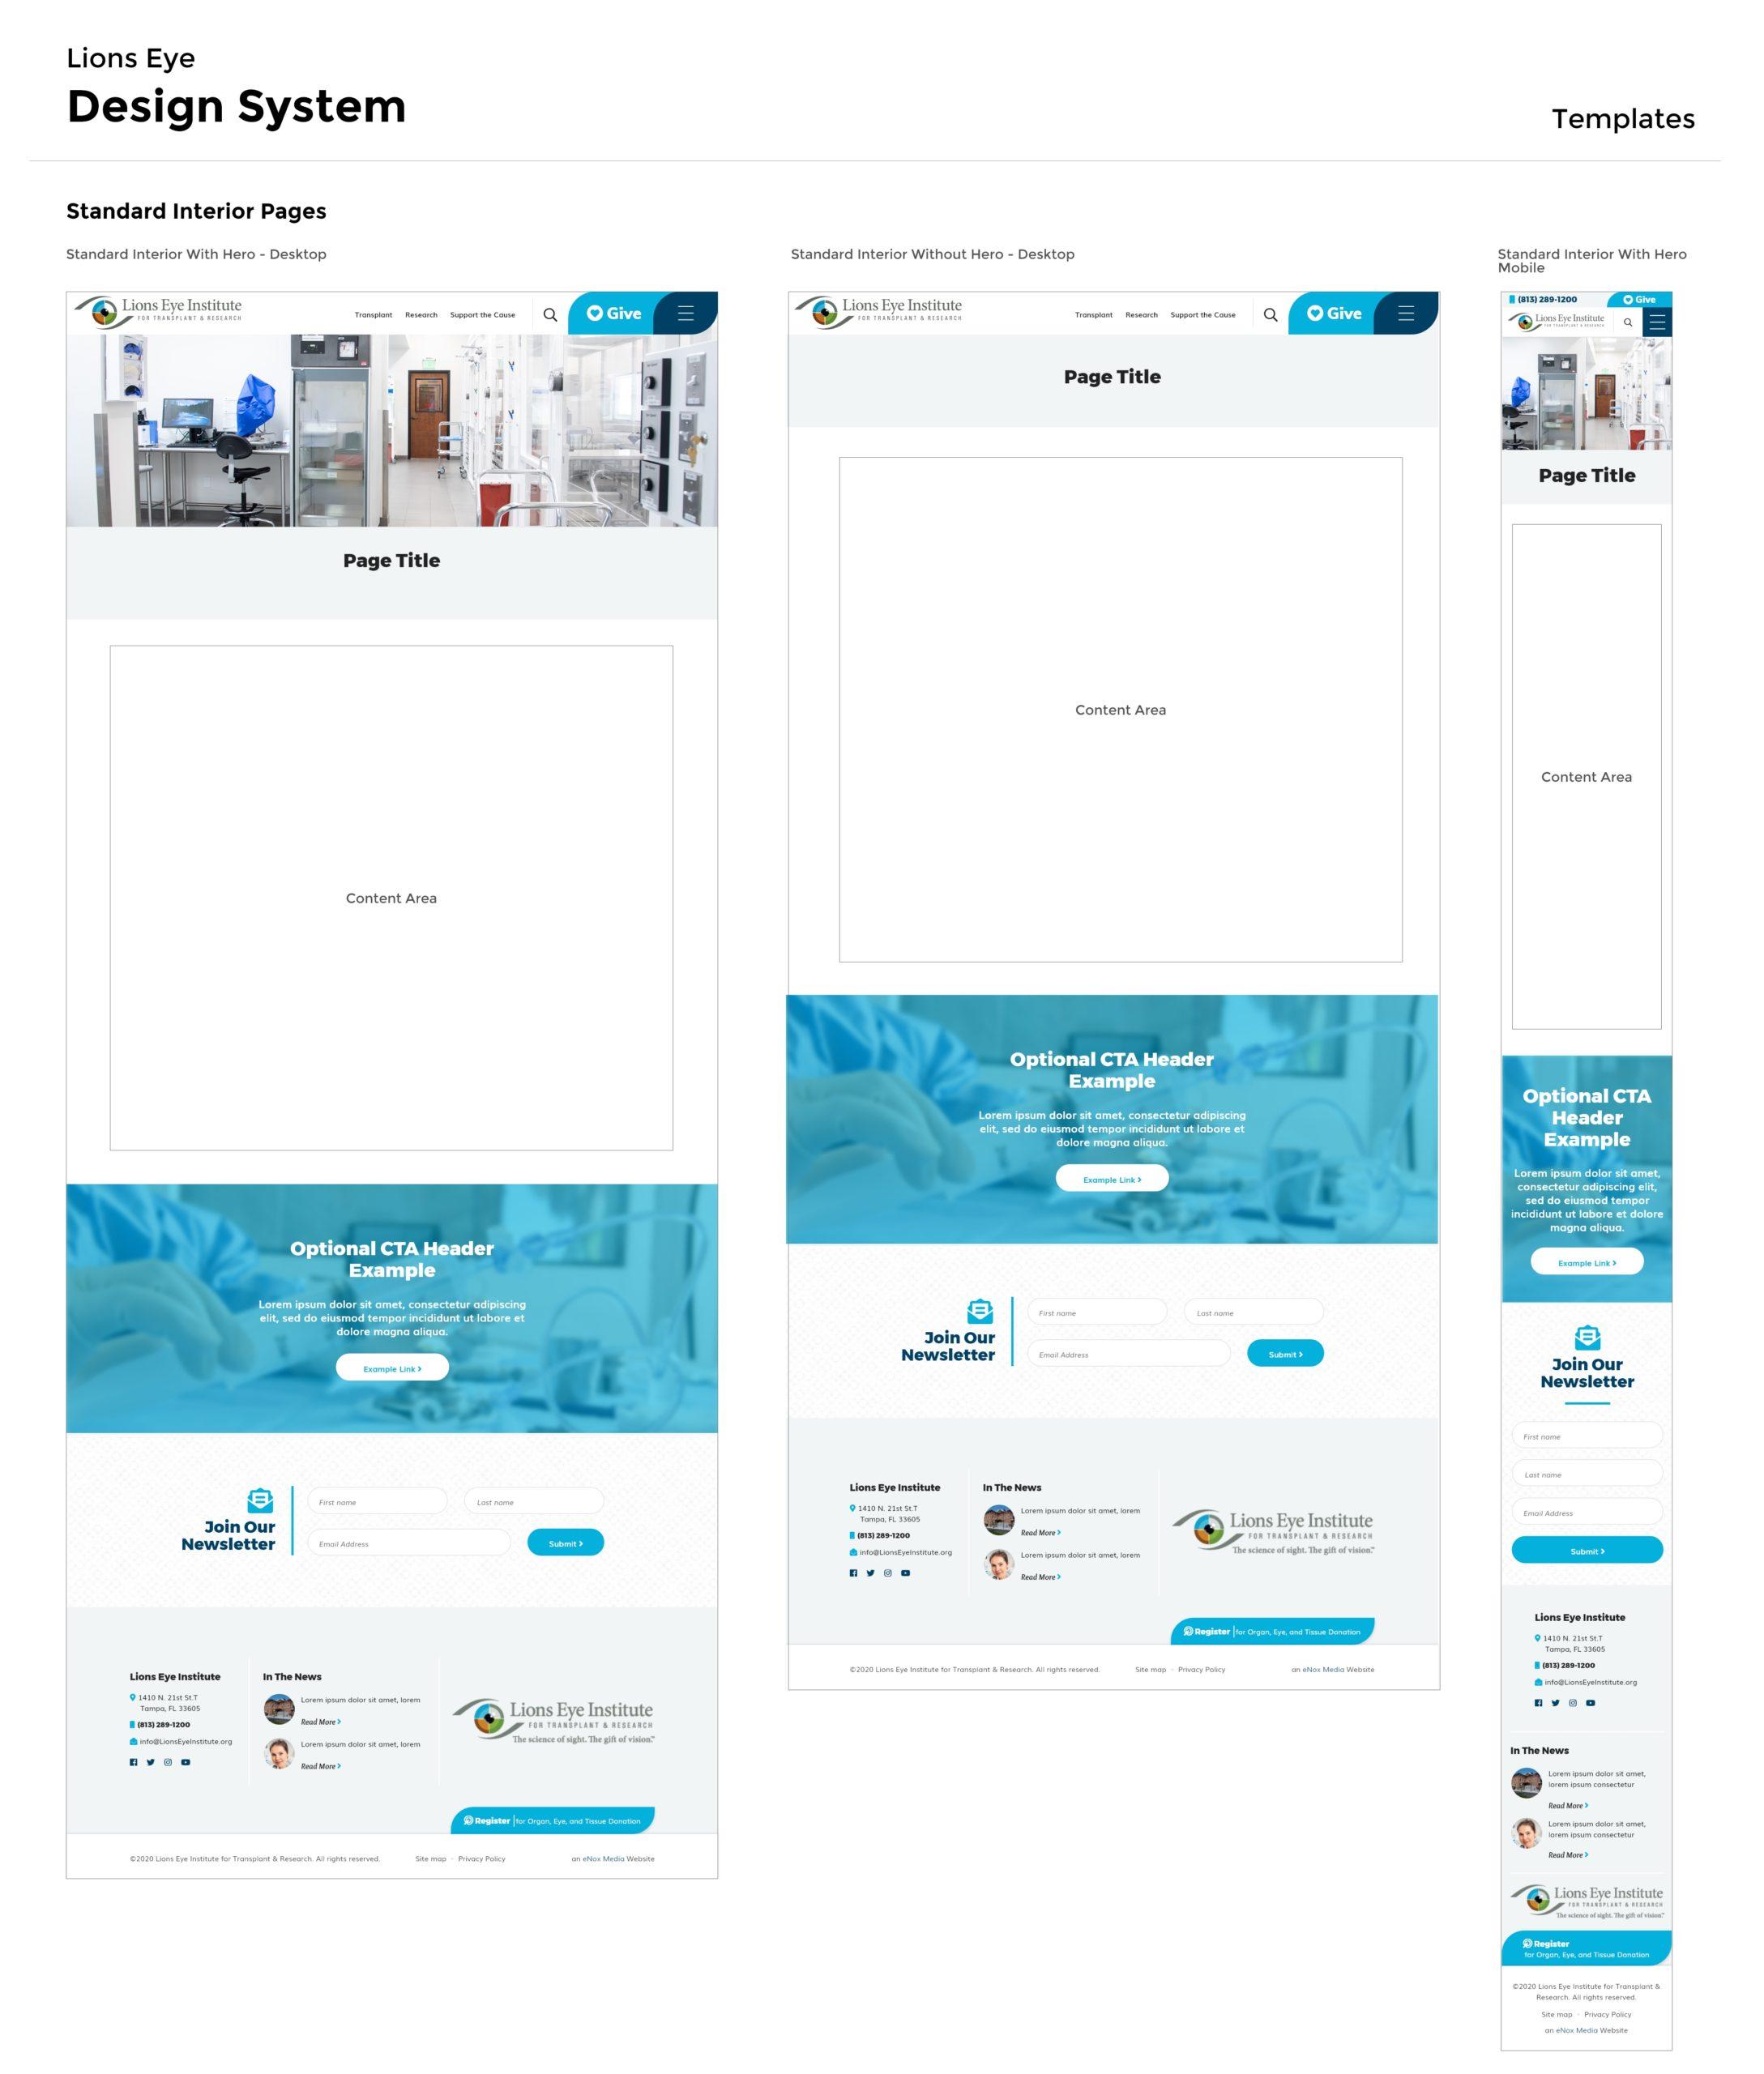 Lions Eye Design System - Templates